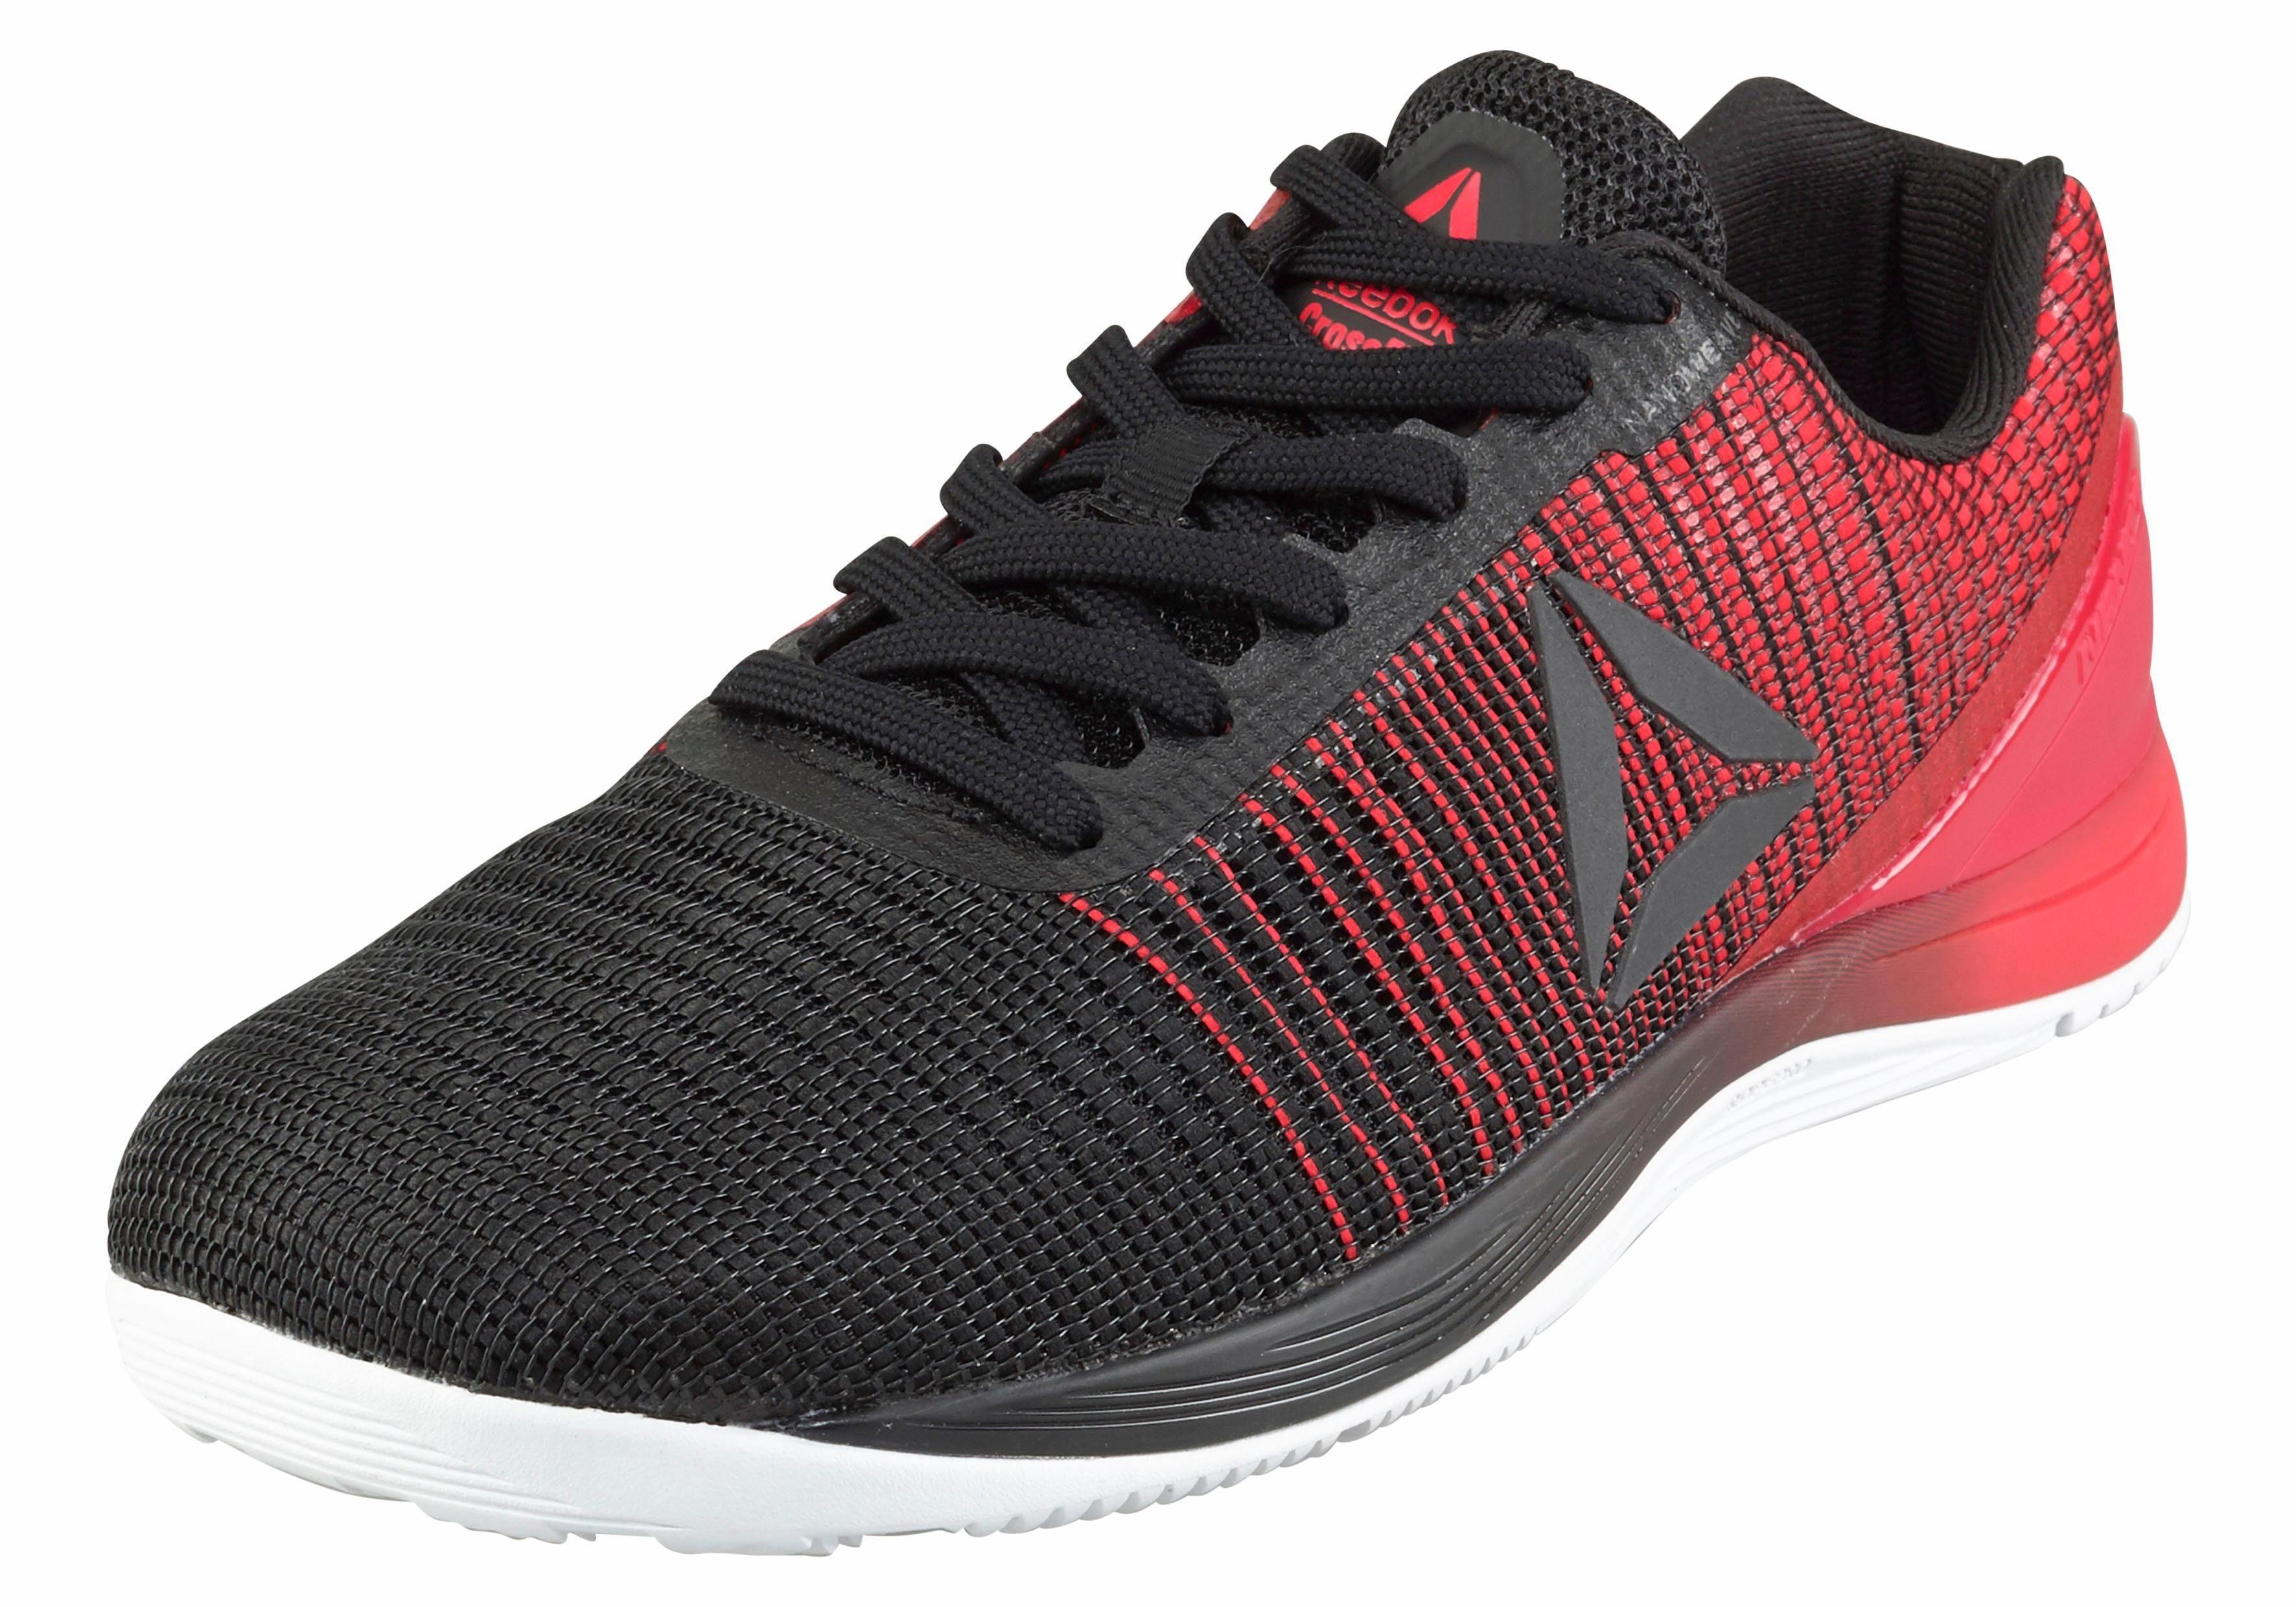 Reebok - Crossfit Nano 7.0 Chaussures De Sport - Hommes - Chaussures - Noir - 44,5